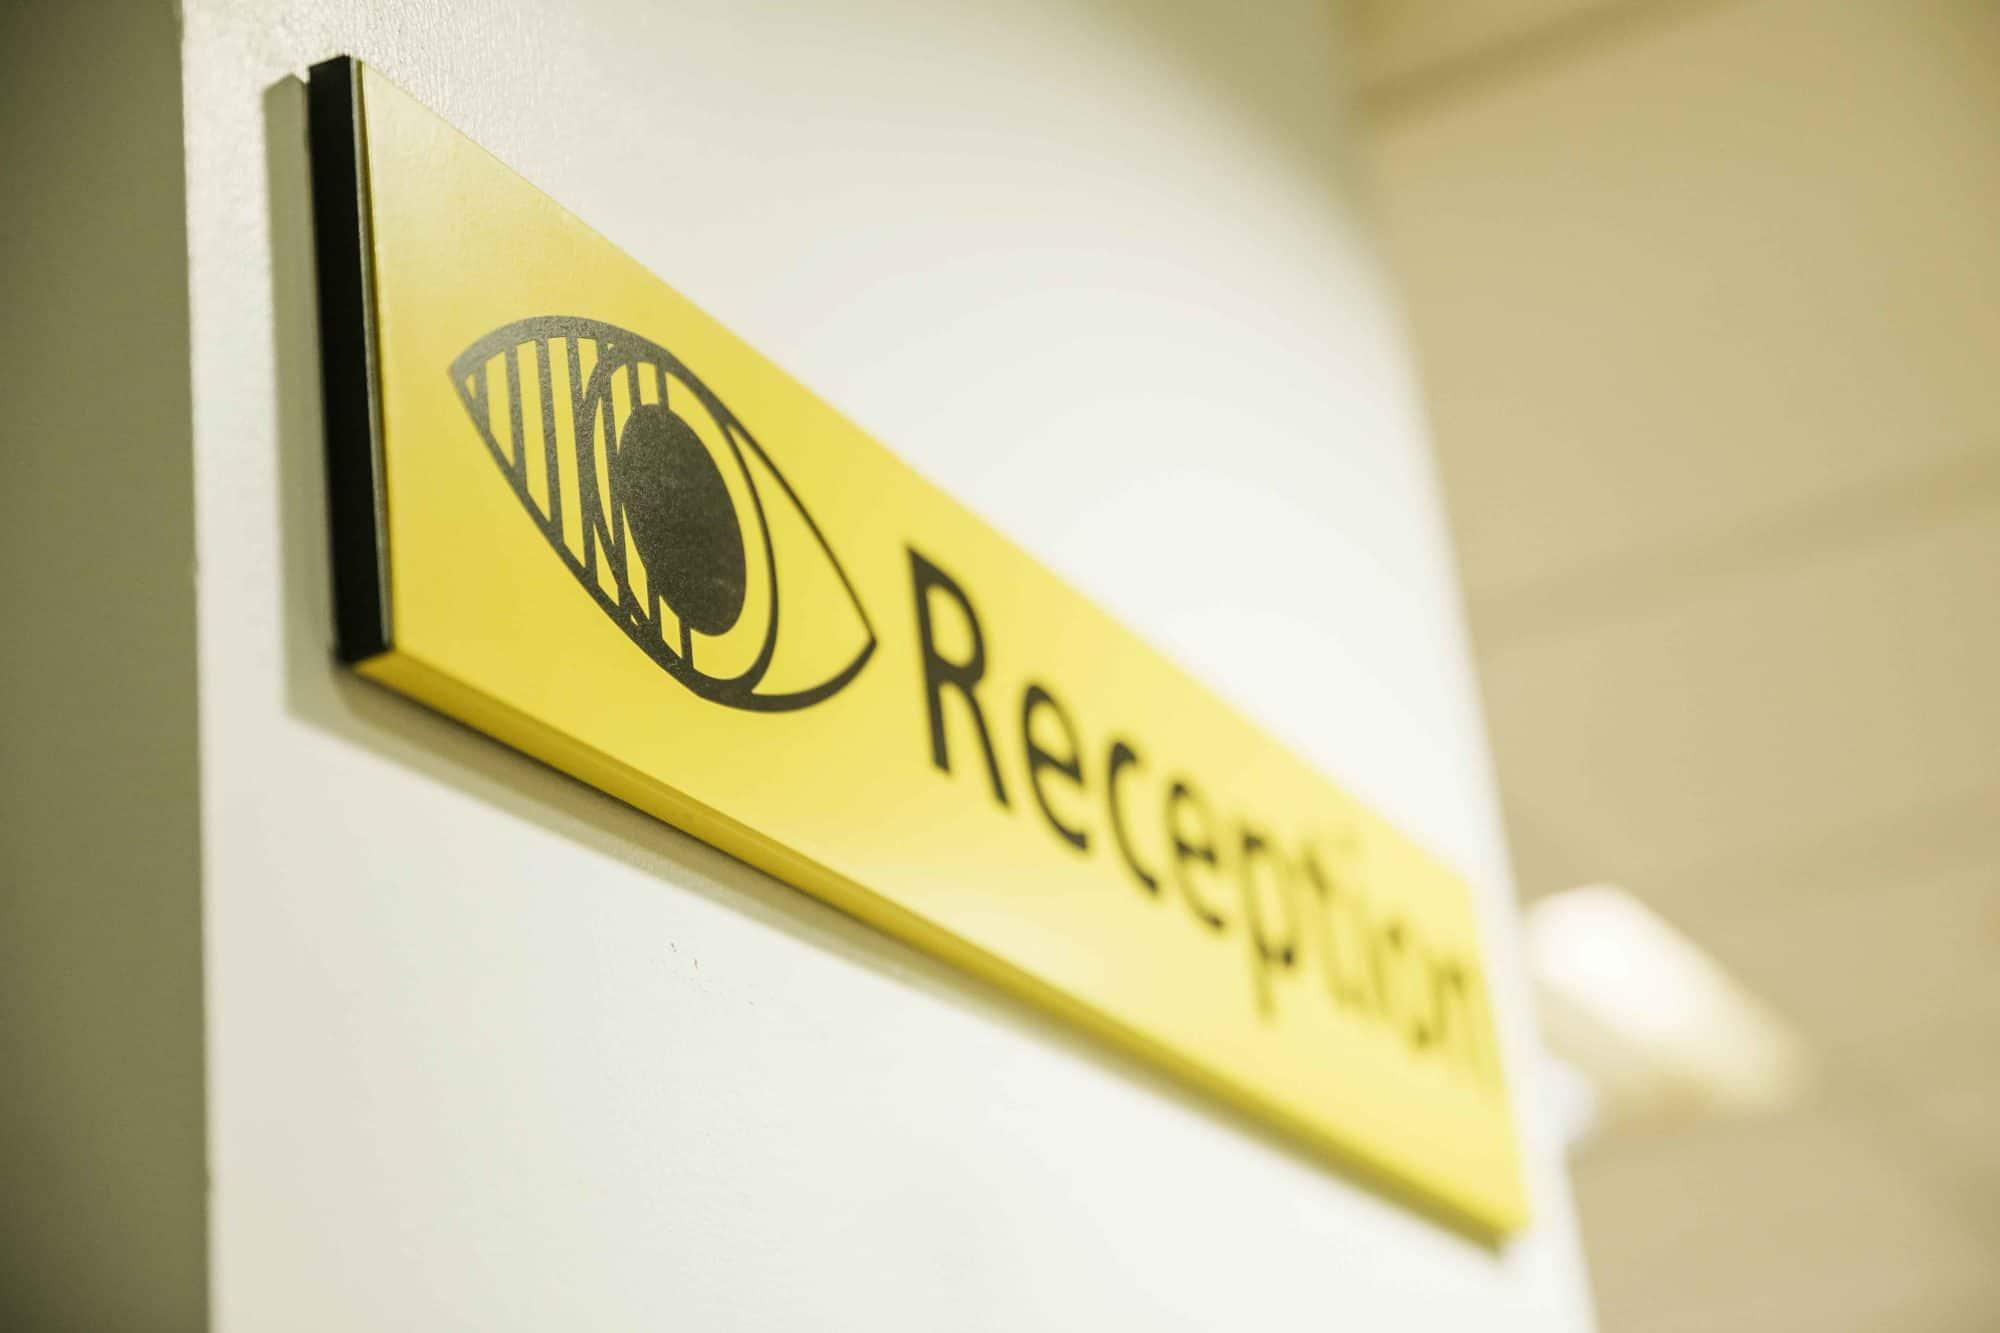 eye clinic reception sign